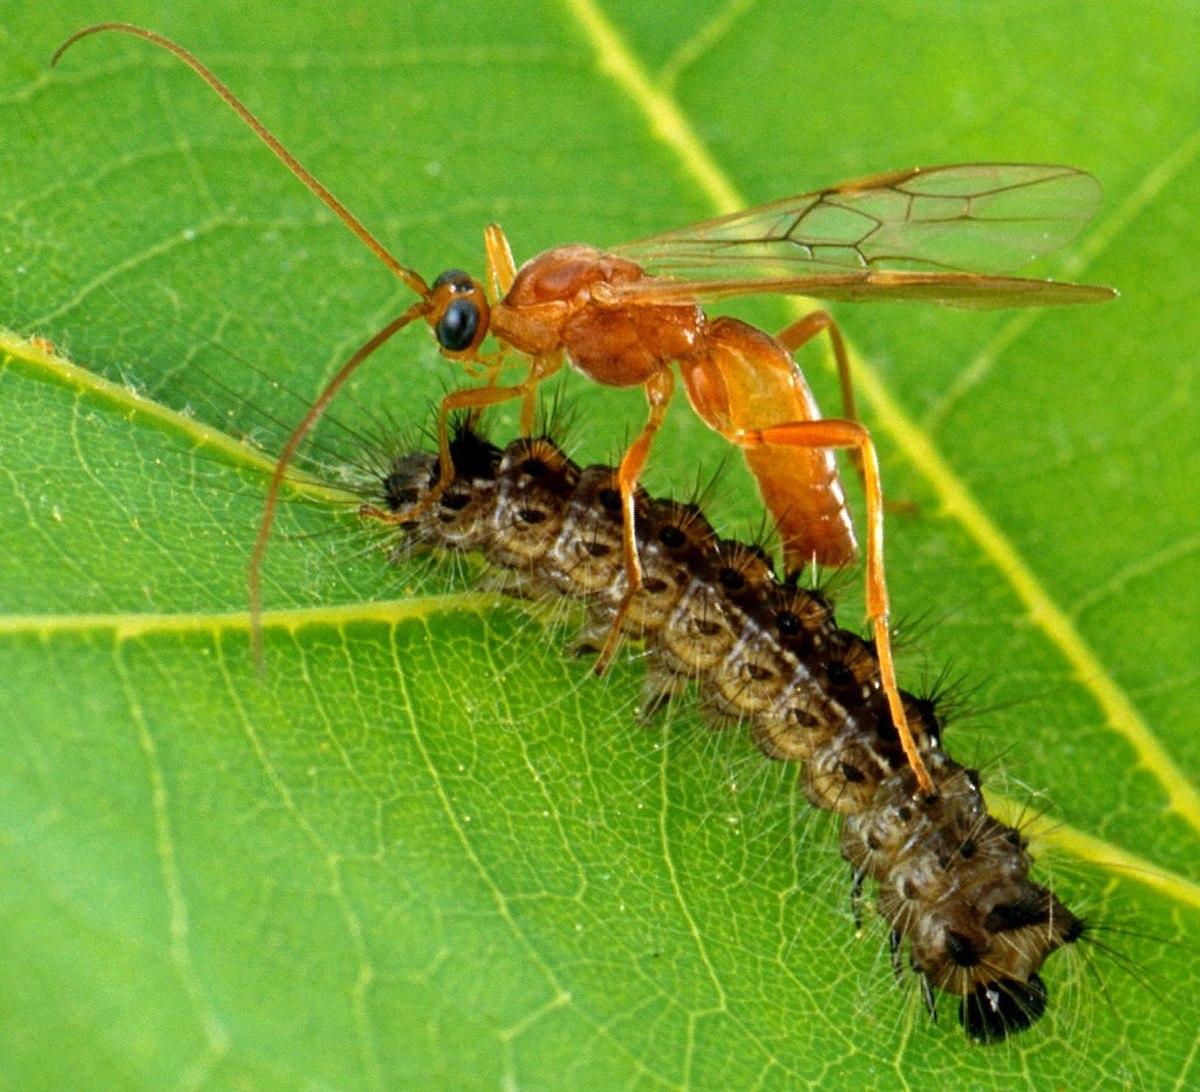 Braconid wasp attacks caterpillar.